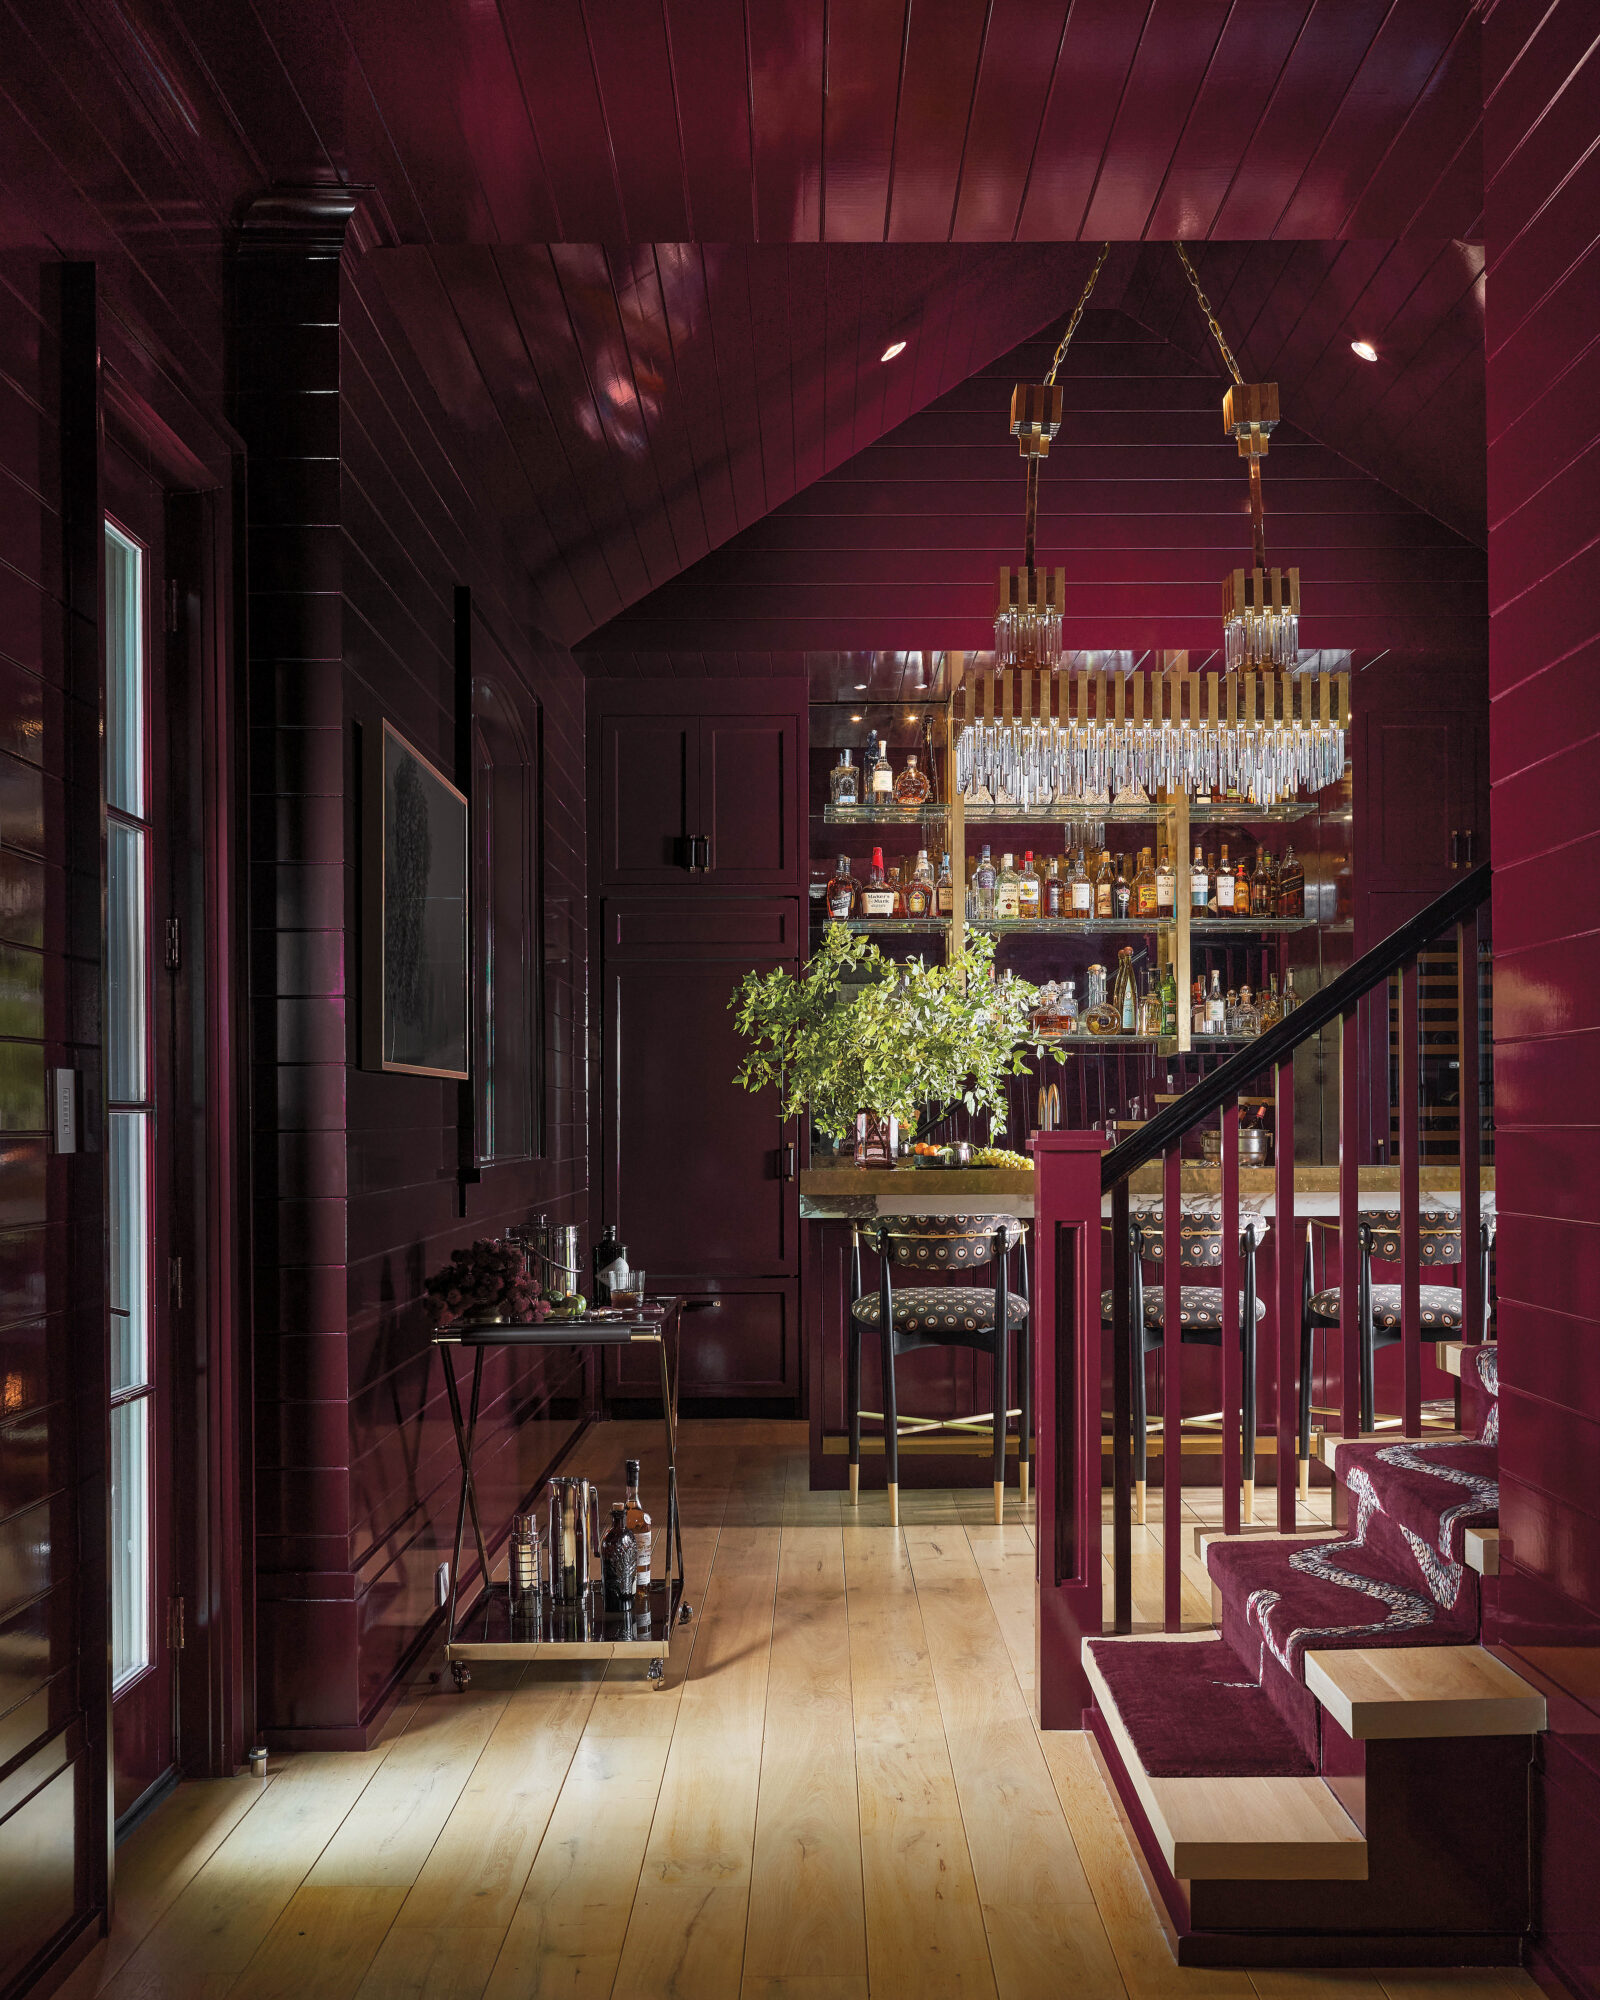 burgandy wine room with paneling